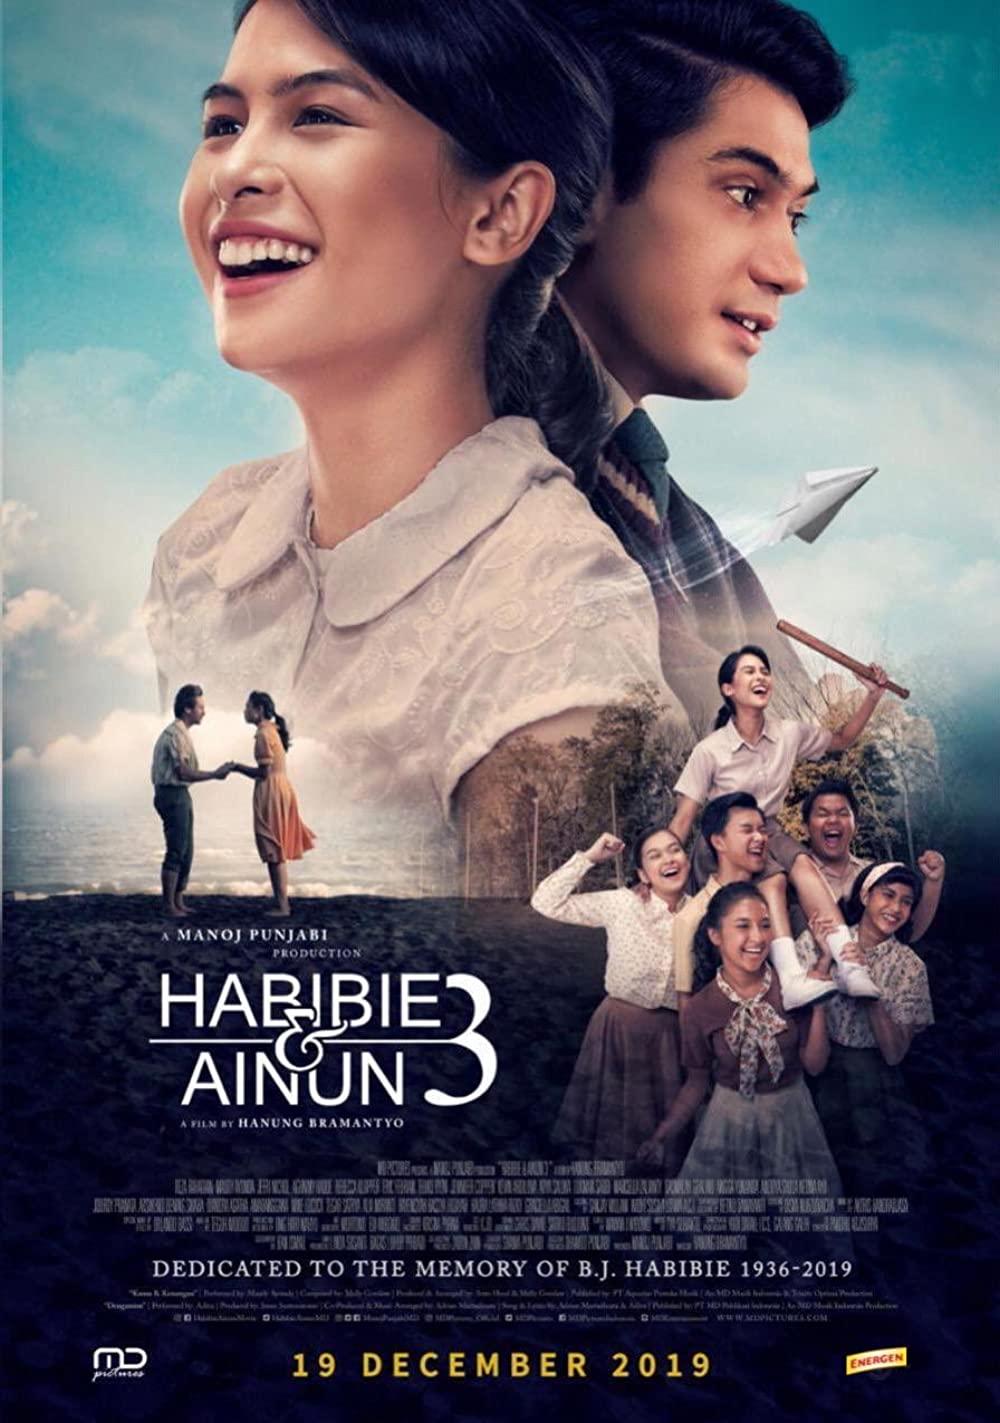 Habibie & Ainun 3 (2019) บันทึกรักฮาบีบีและไอนุน 3